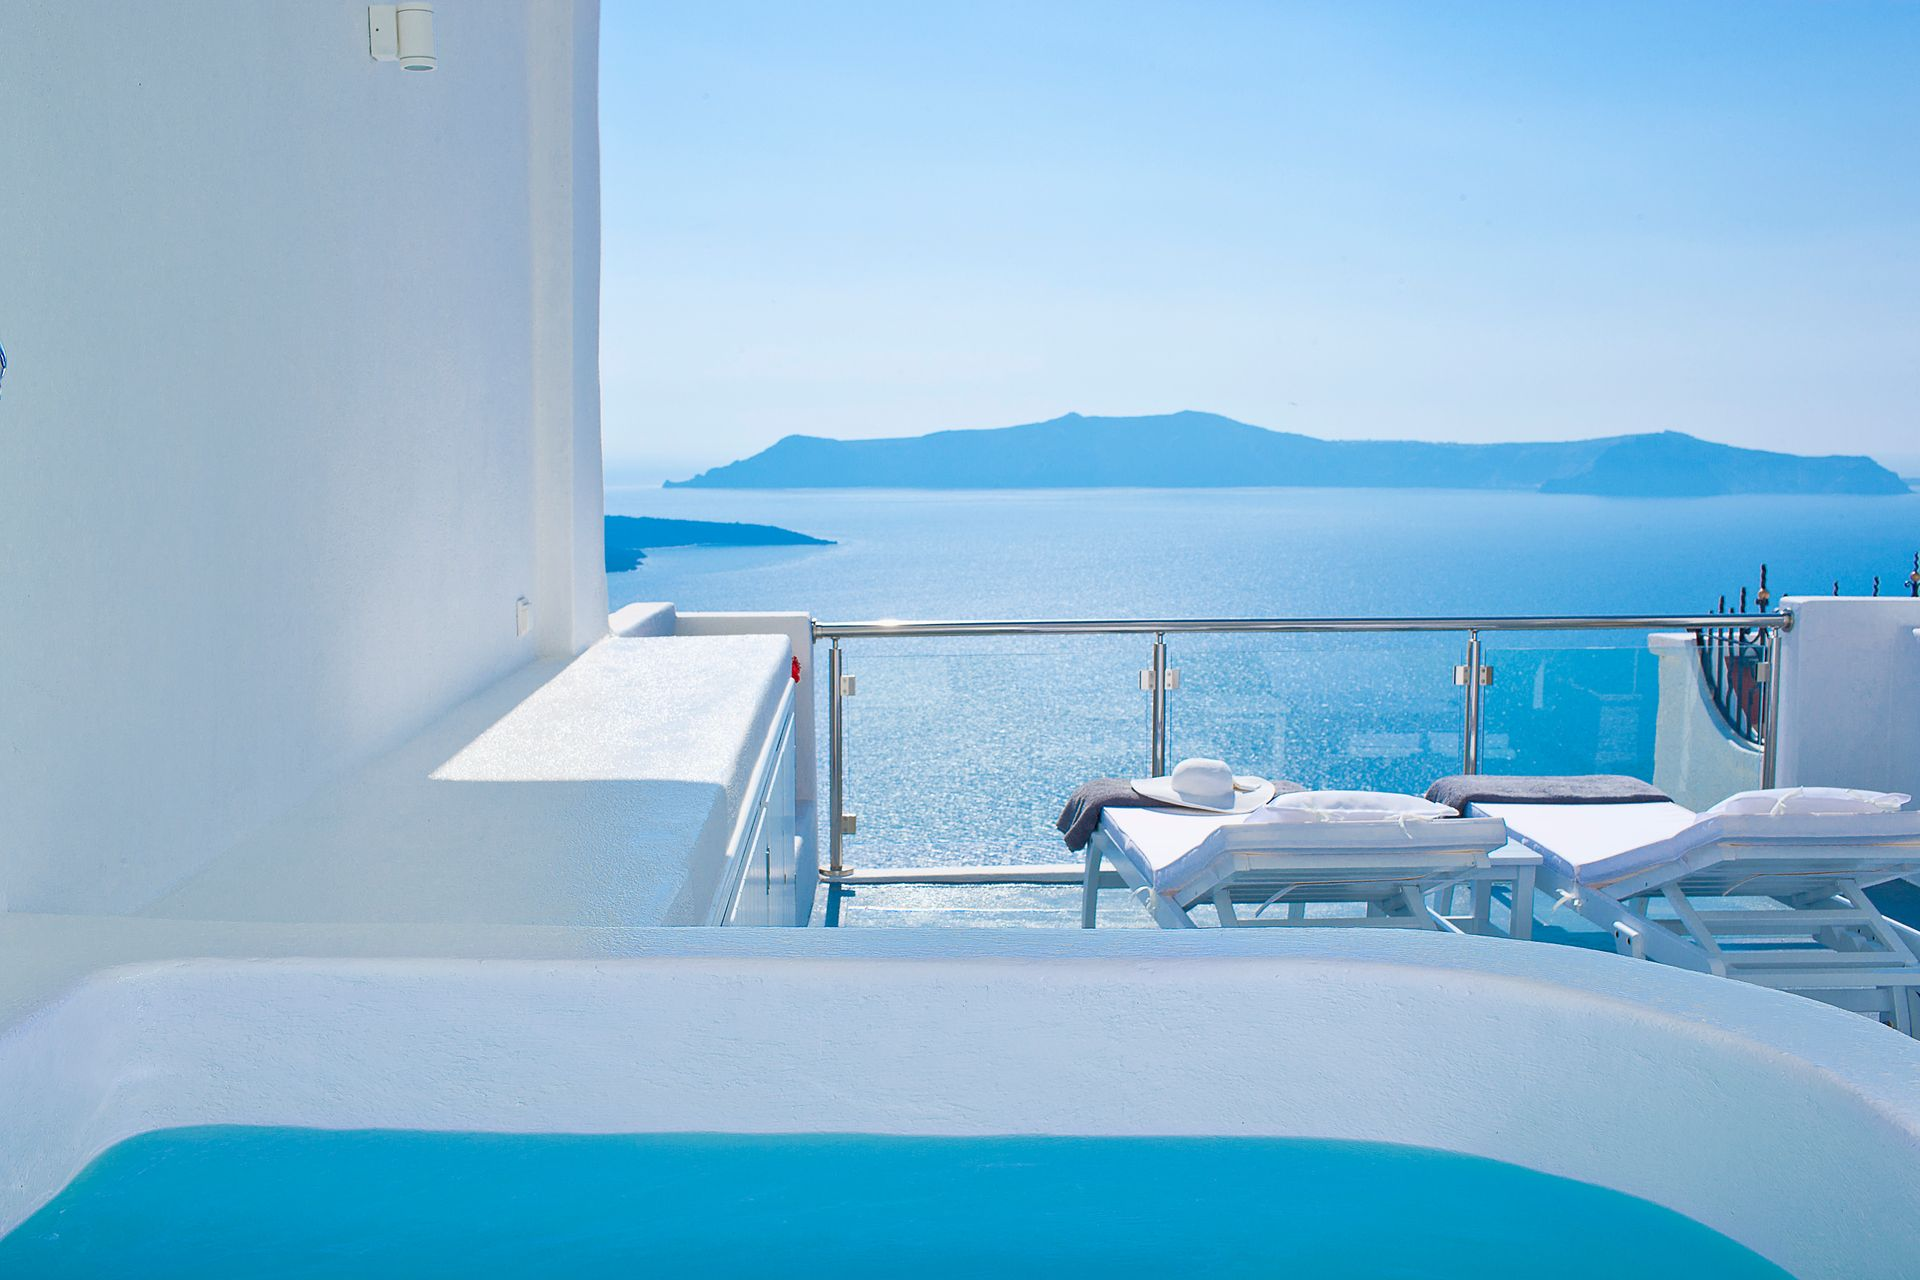 4* Asteras Villas Santorini - Σαντορίνη ✦ 2 Ημέρες (1 Διανυκτέρευση) ✦ 2 άτομα ✦ Πρωινό ✦ έως 20/09/2020 ✦ Υπέροχη Τοποθεσία!